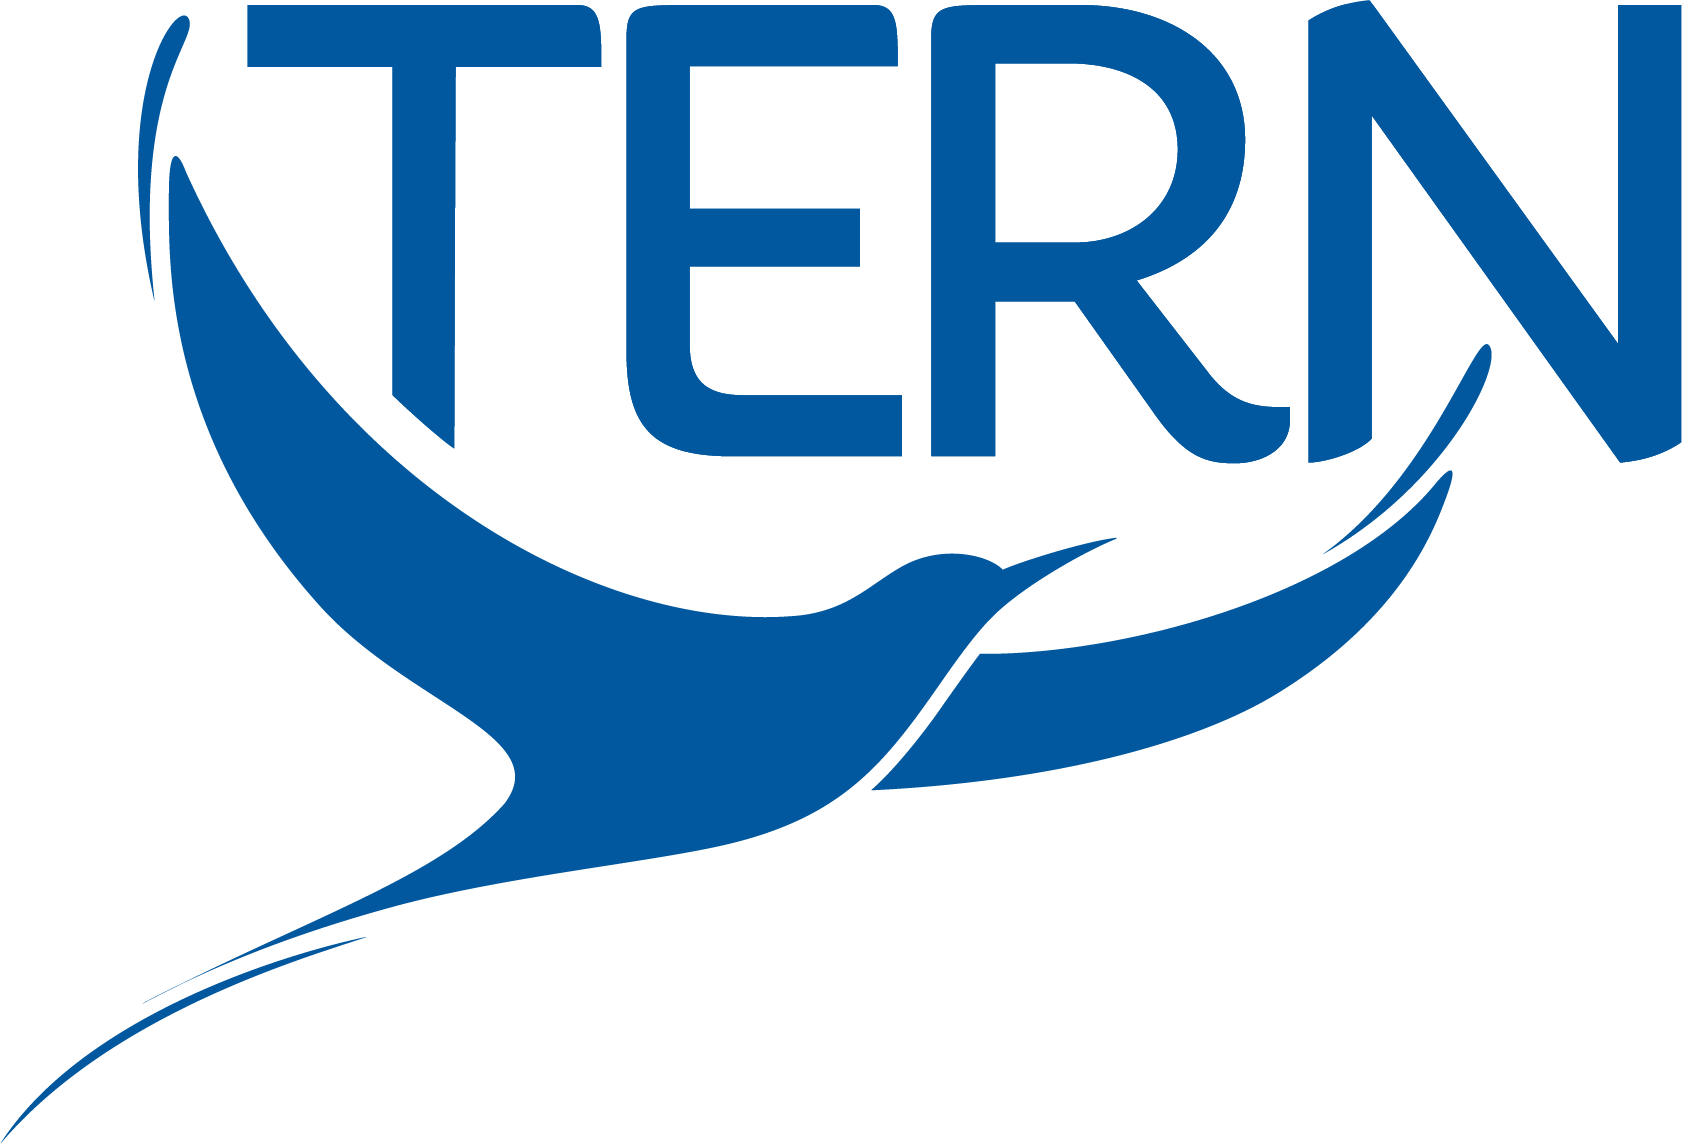 TERN [logo]